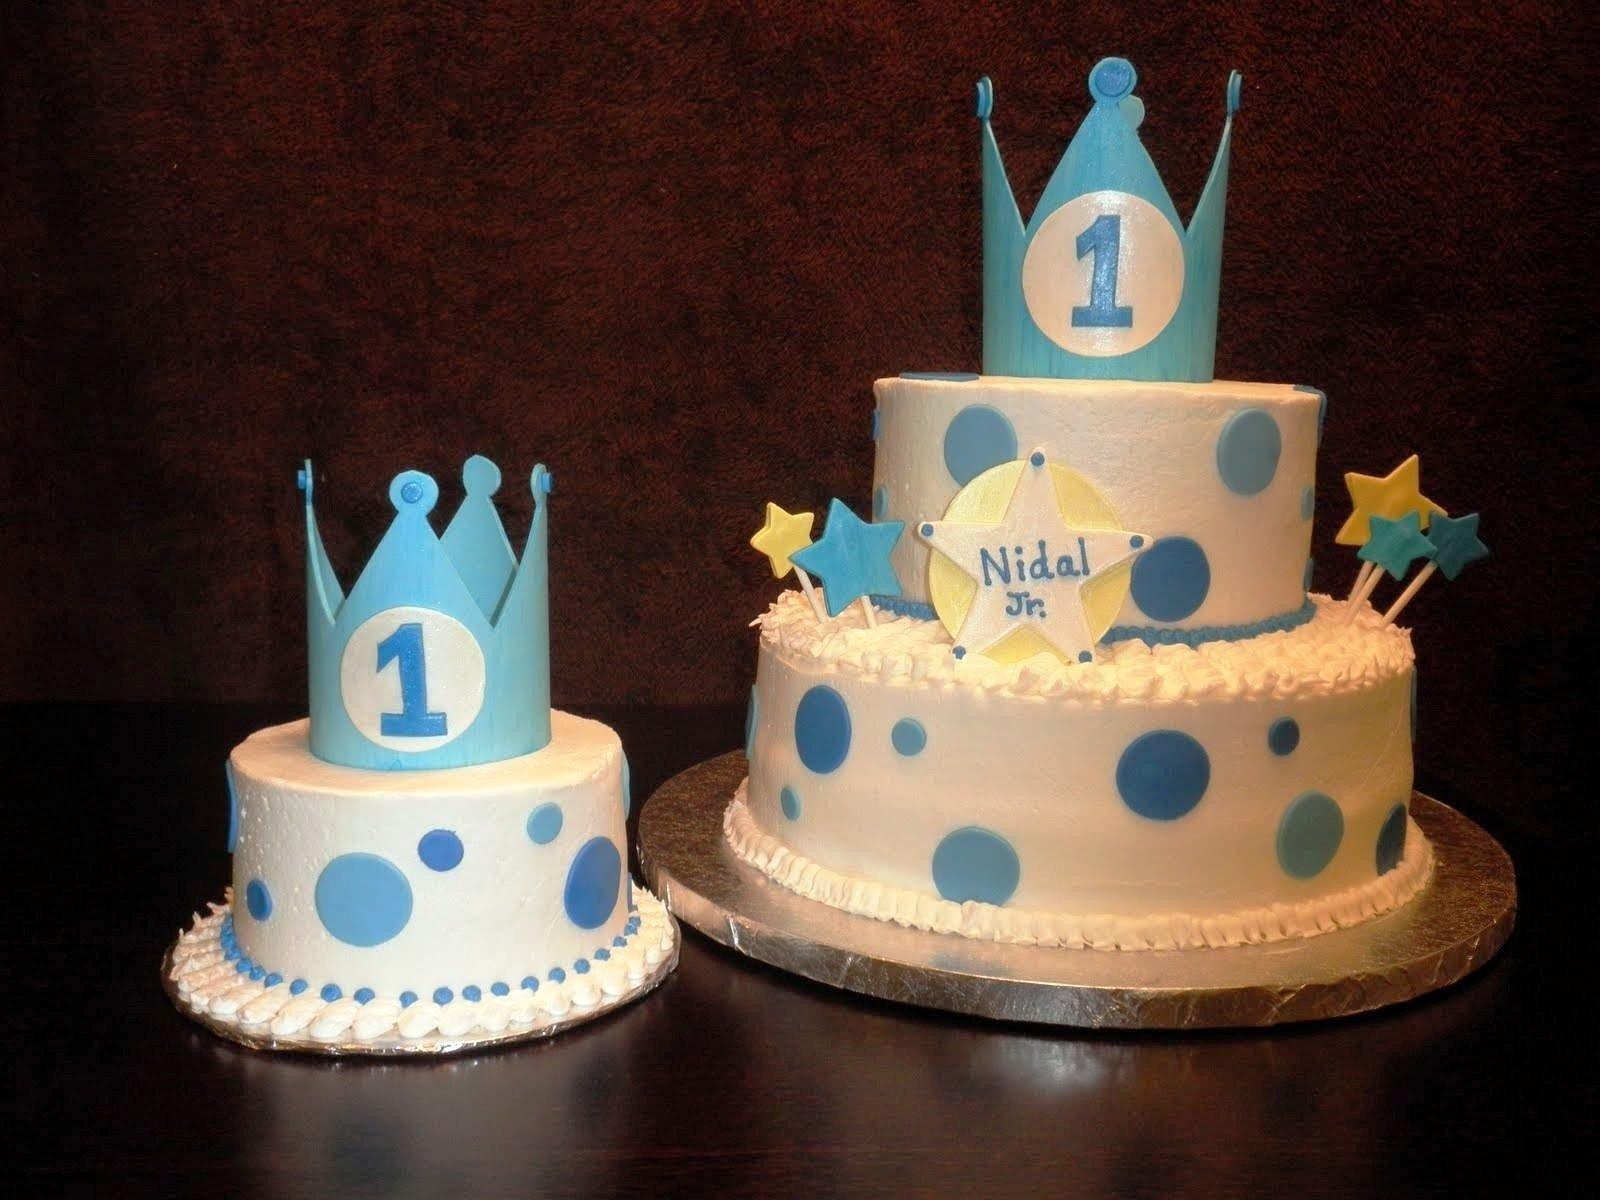 Imgenes De Ideas For 1st Birthday Cake For Boy